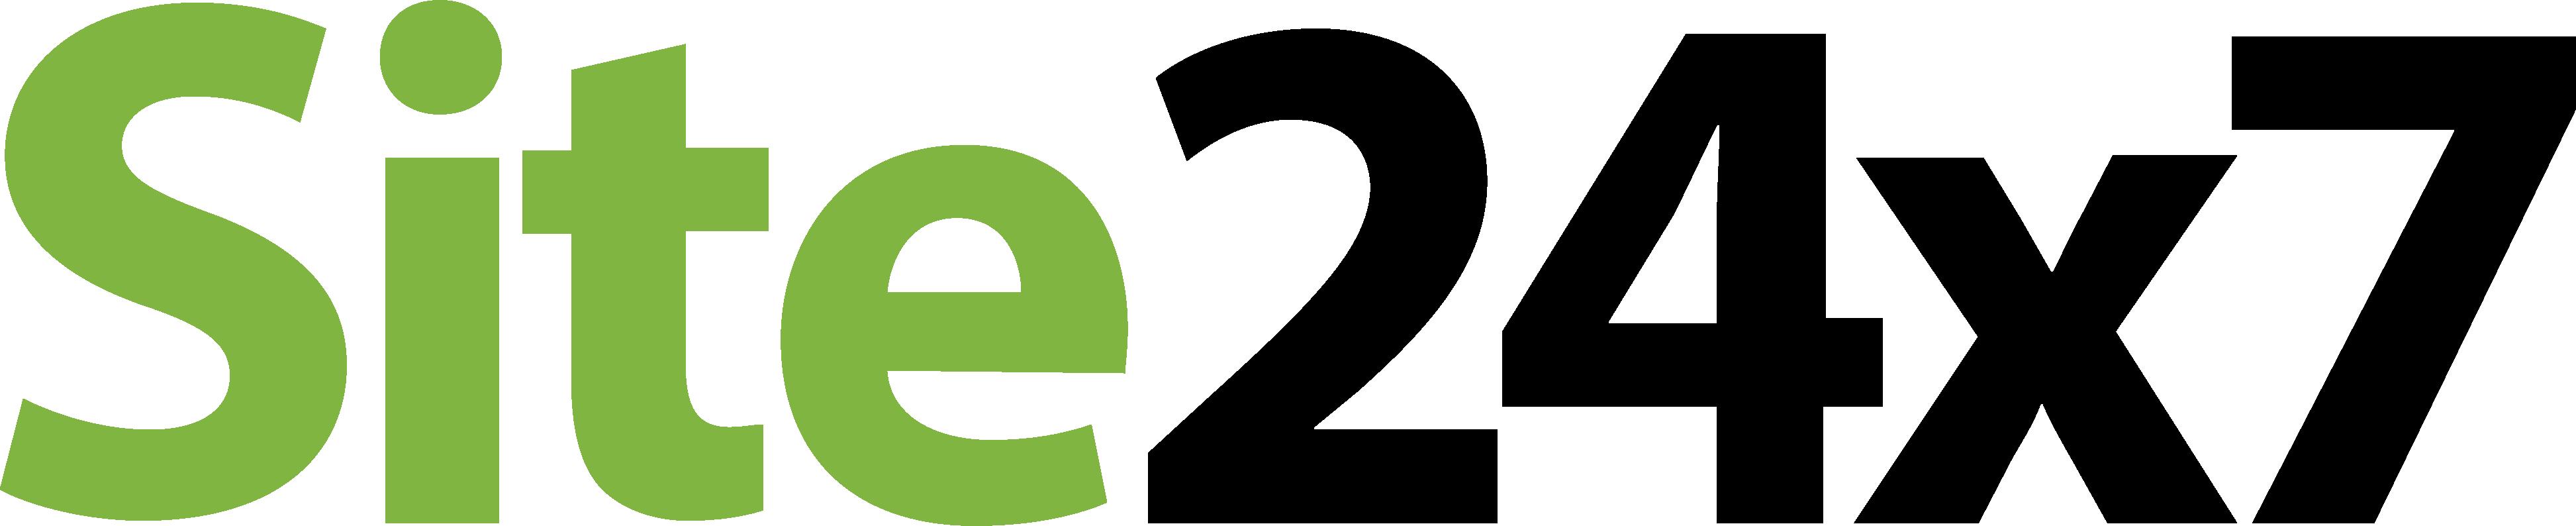 site24x7 logotipo